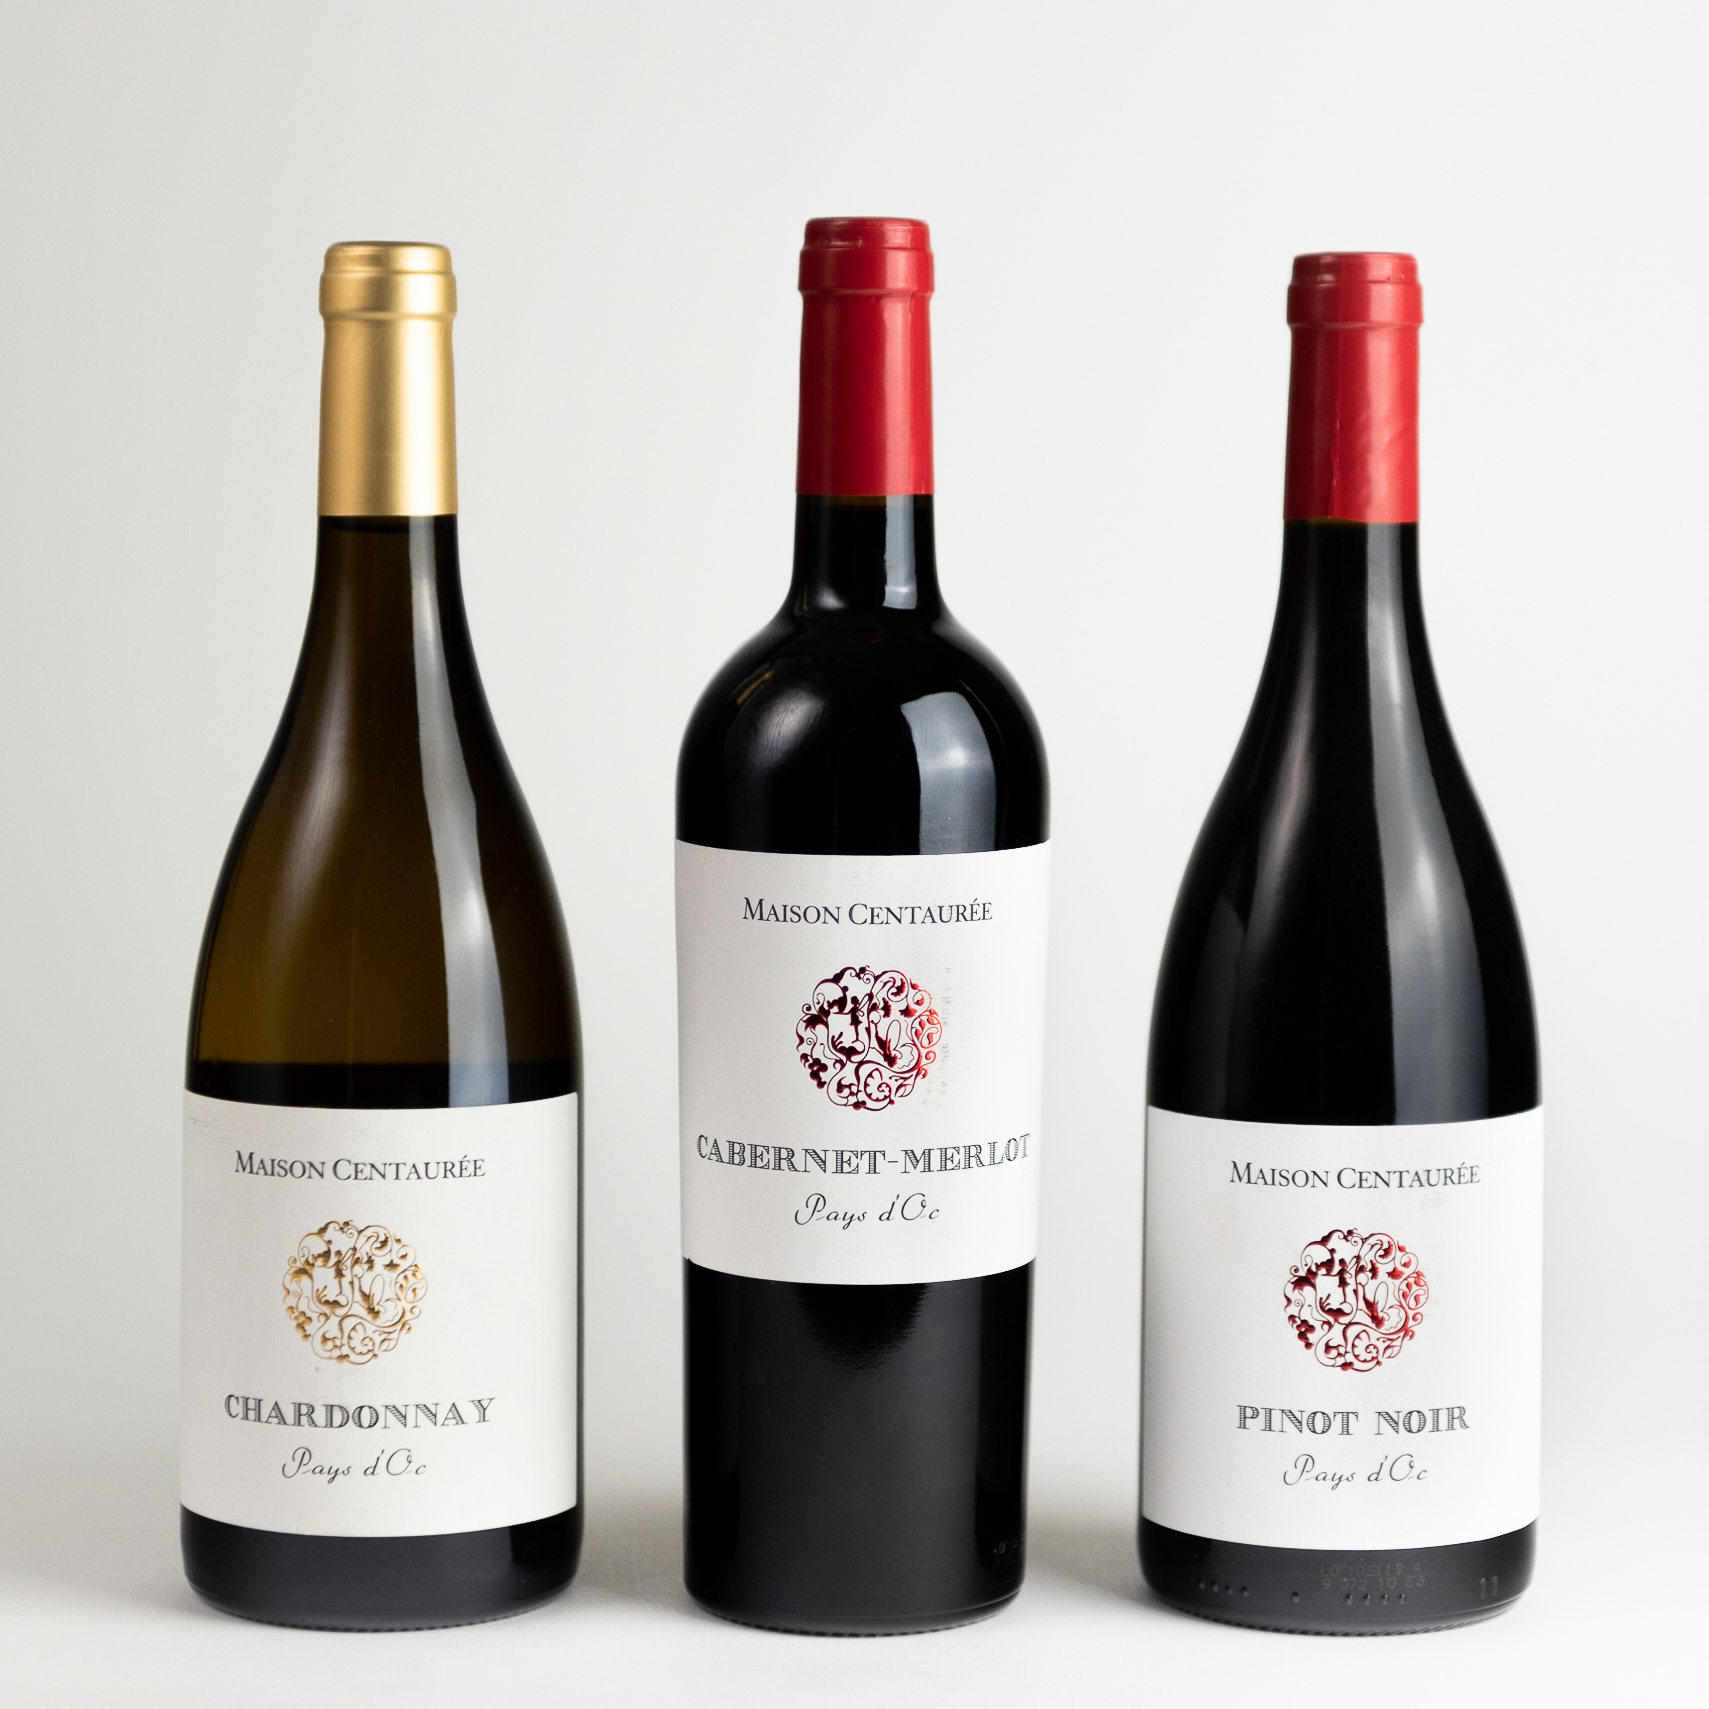 Maison Centaurée | Chardonnay, Cabernet Merlot & Pinot noir